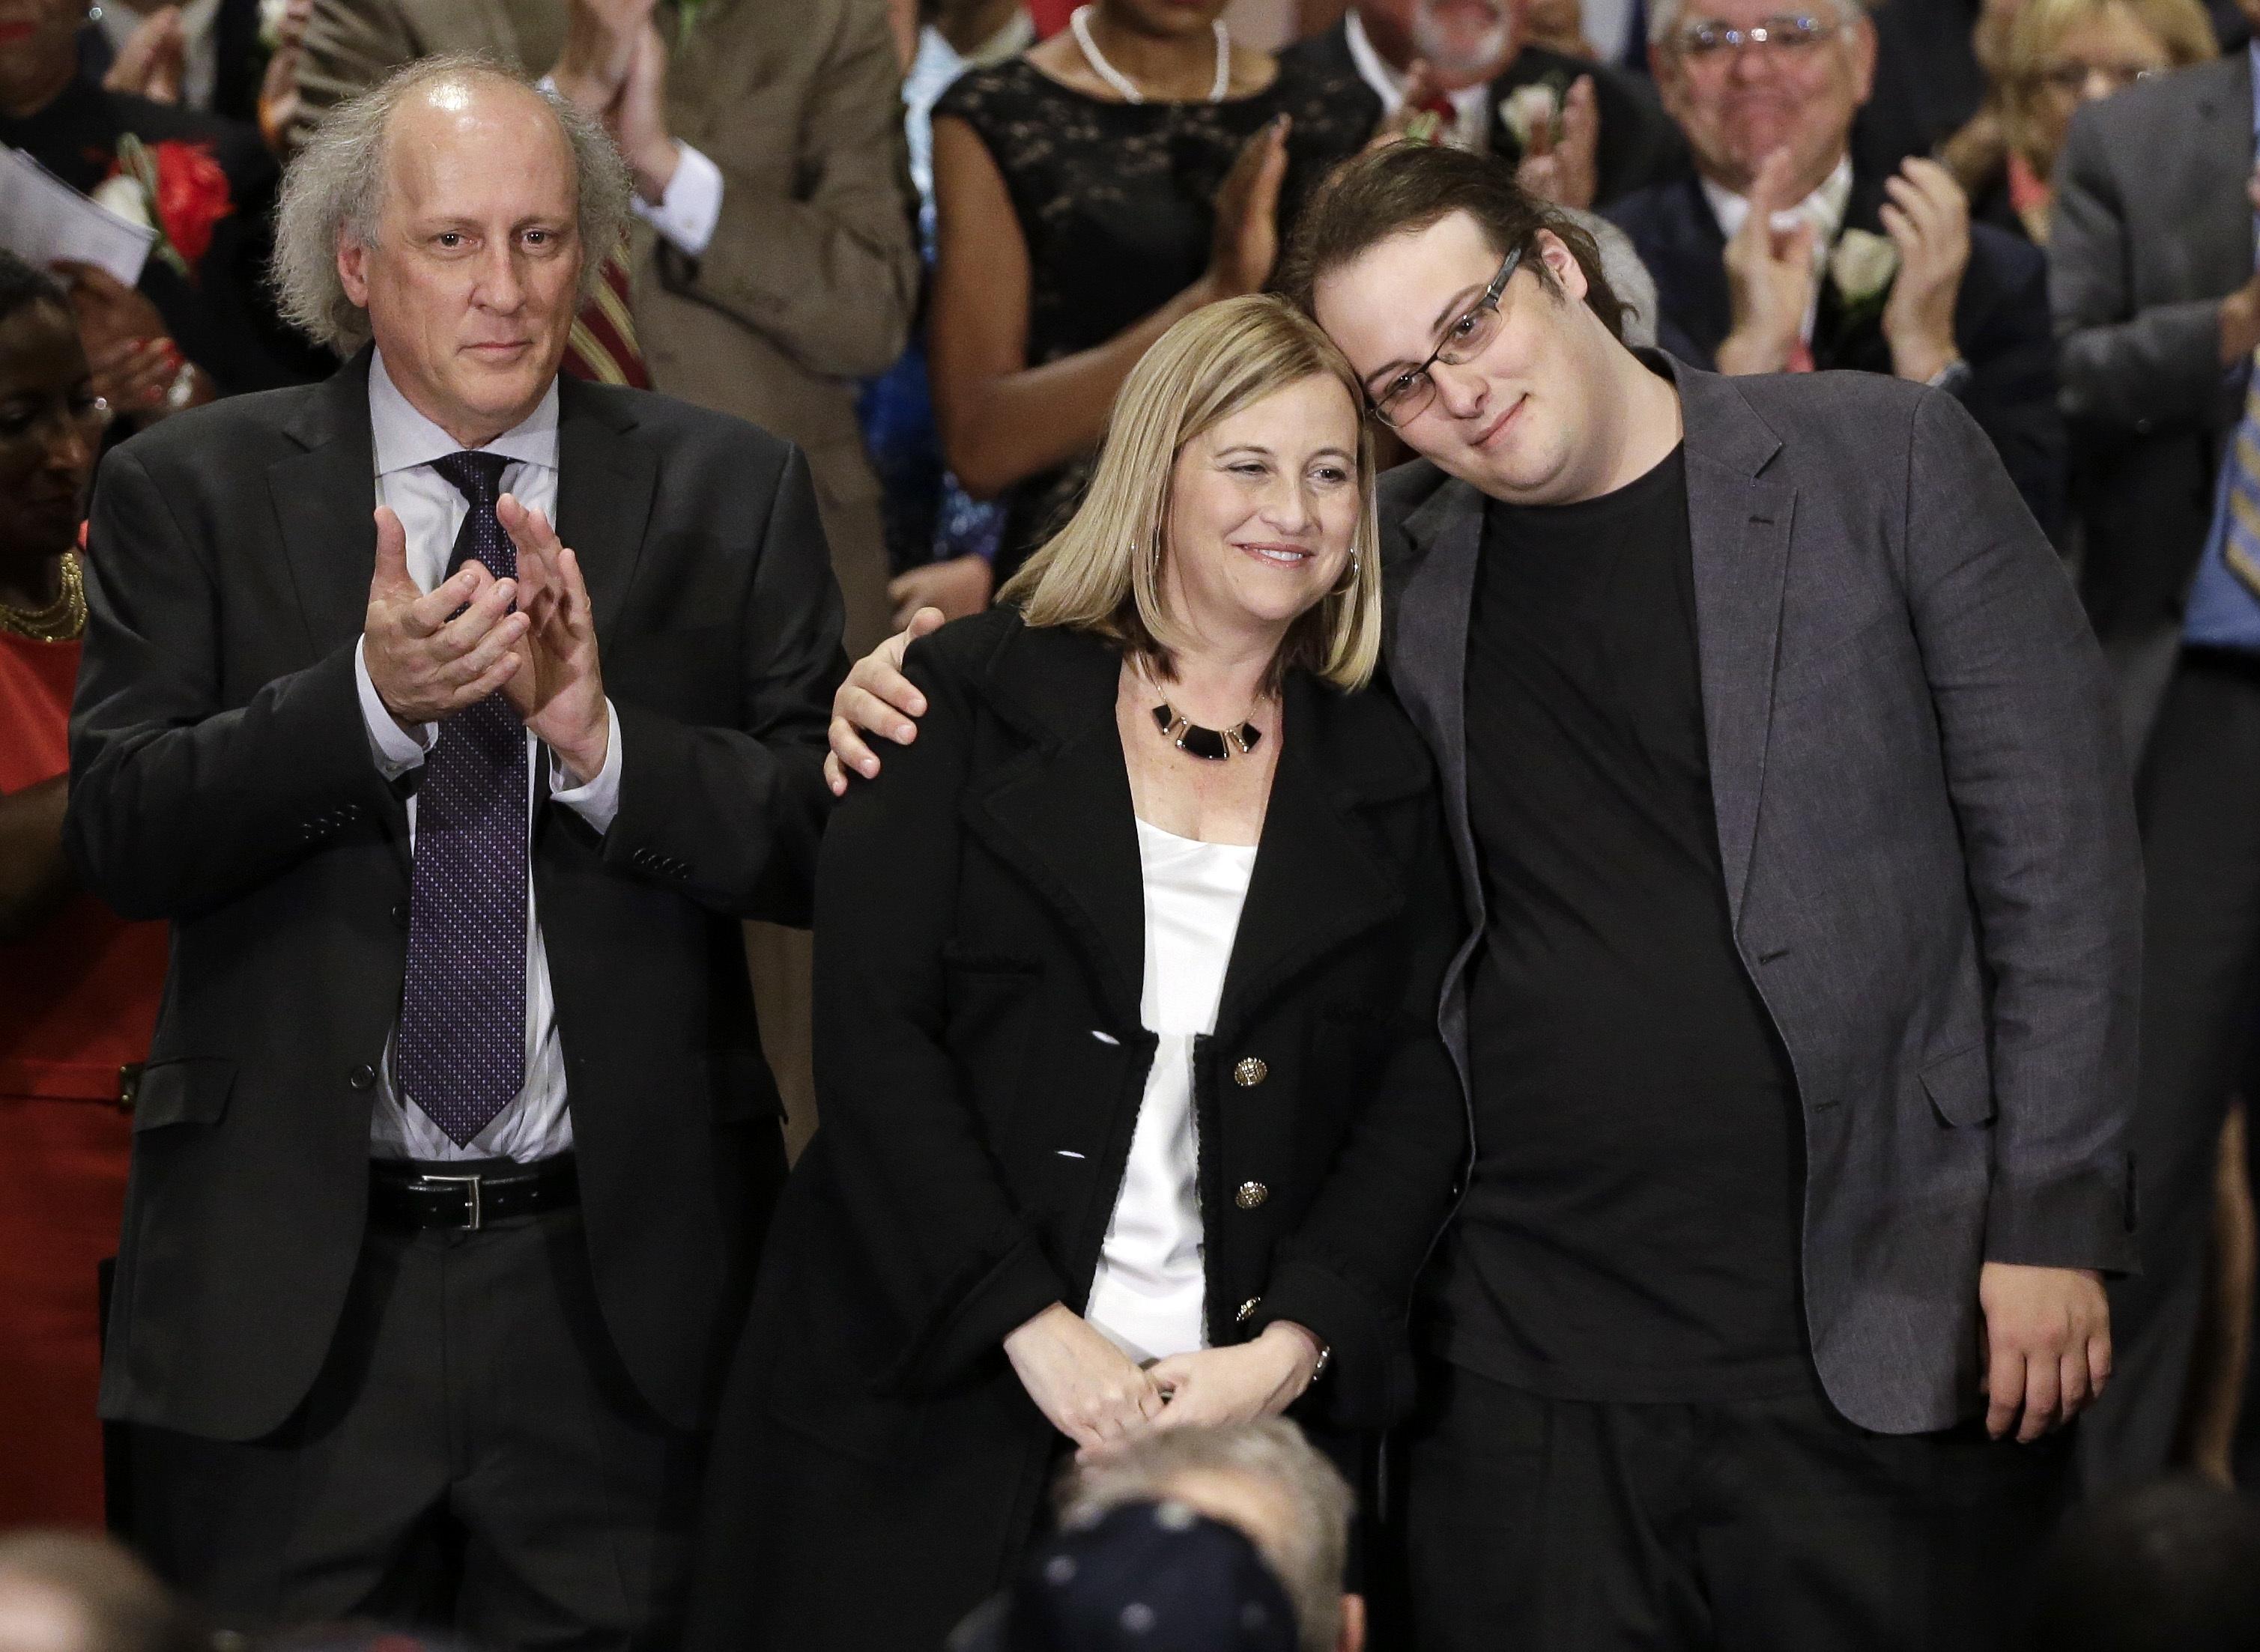 Nashville Mayor Megan Barry, center, is hugged by her son, Max, as her husband, Bruce, left, applauds after she was sworn into office in Nashville, Tenn., on Sept. 25, 2015